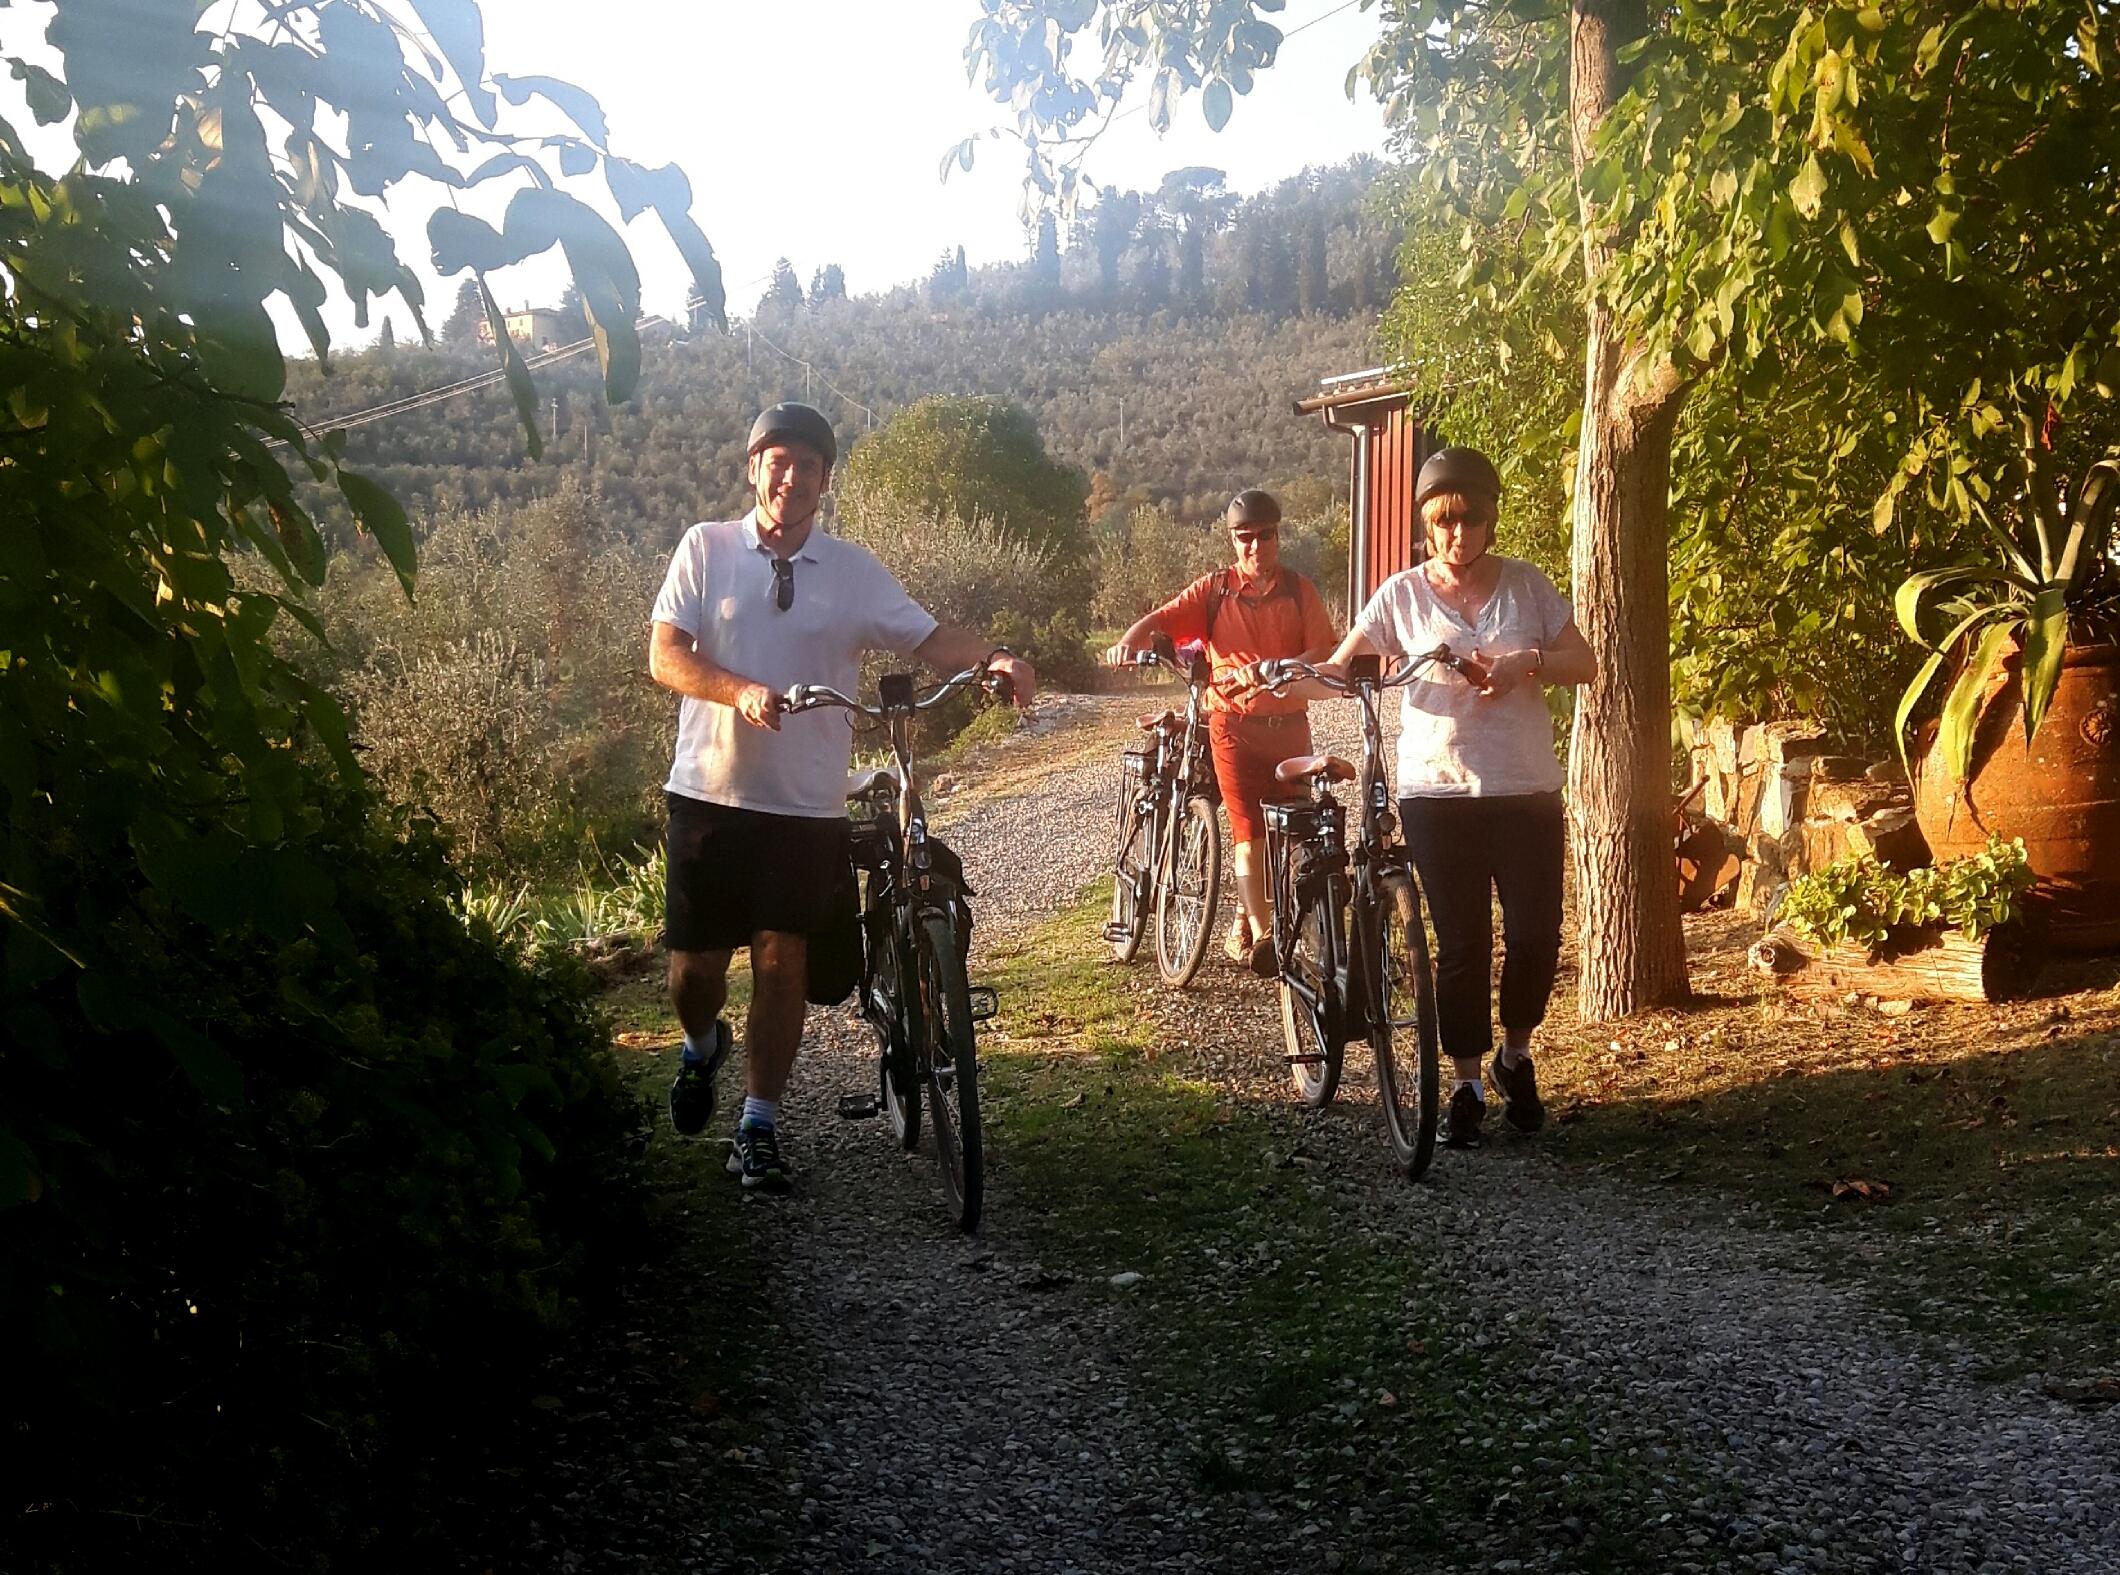 Group on rental bikes florence